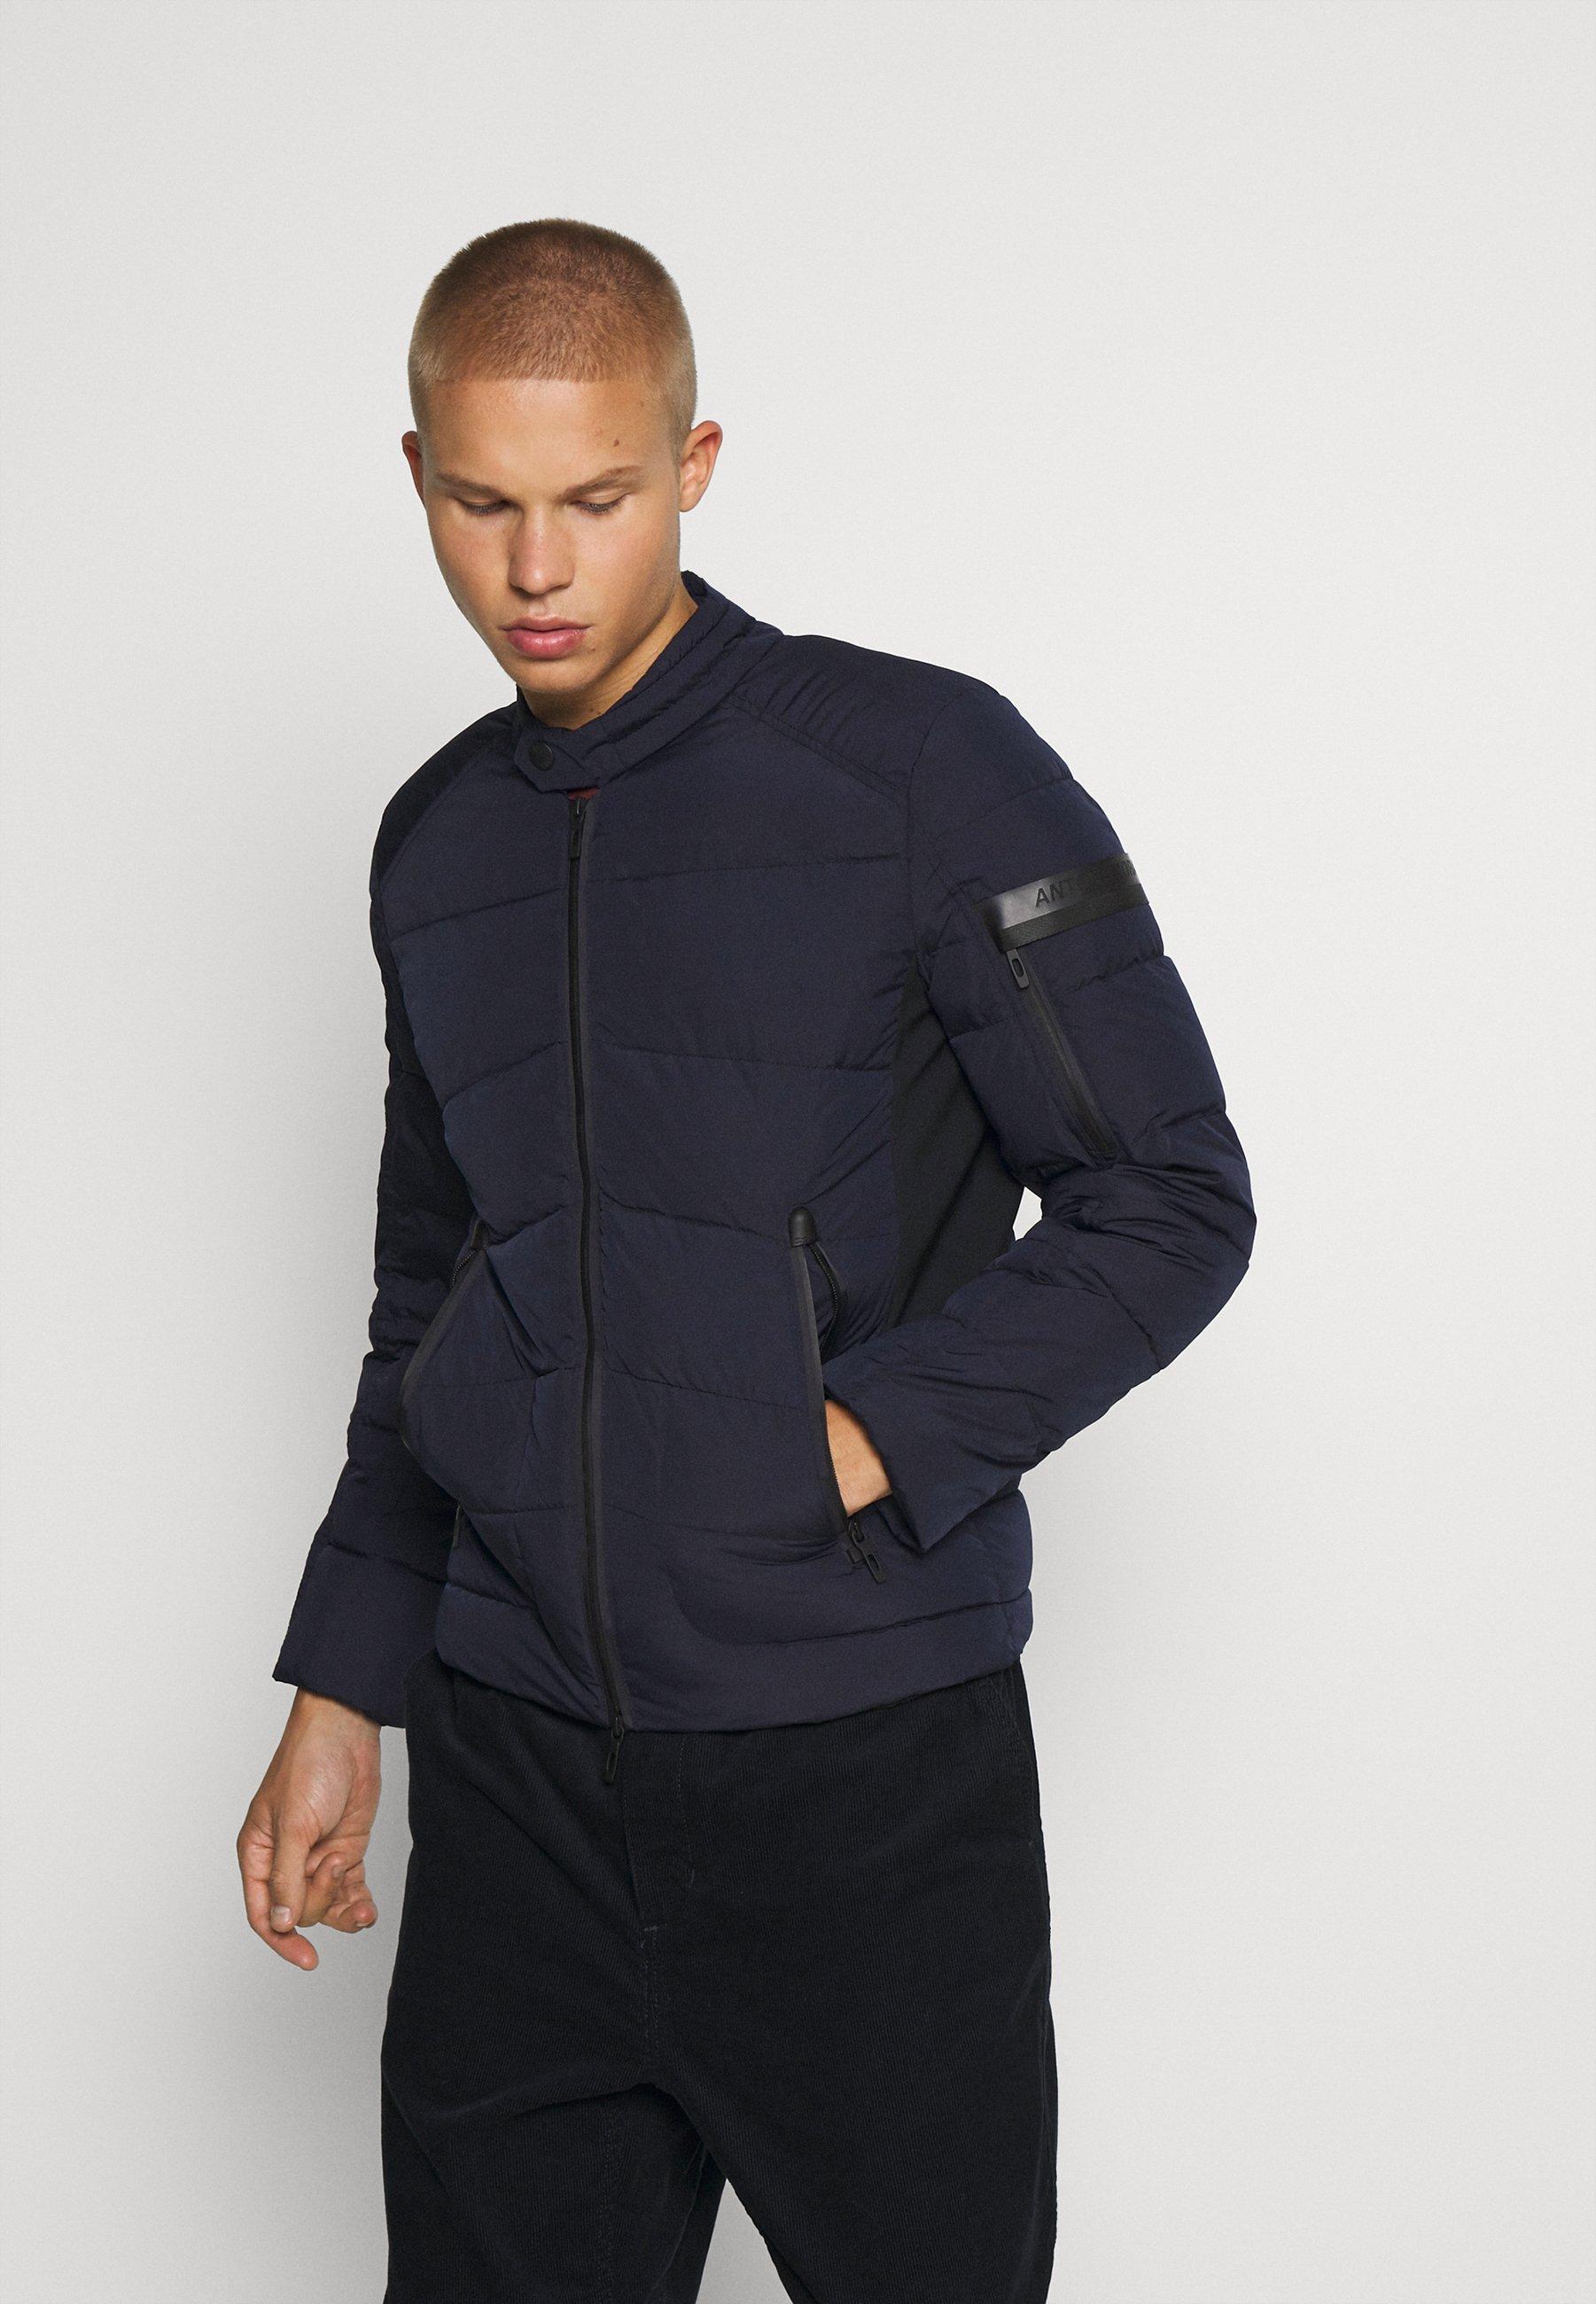 Men COAT IN TECHNO FABRIC CONTRAST IN COMPOUNDNYLON - Light jacket